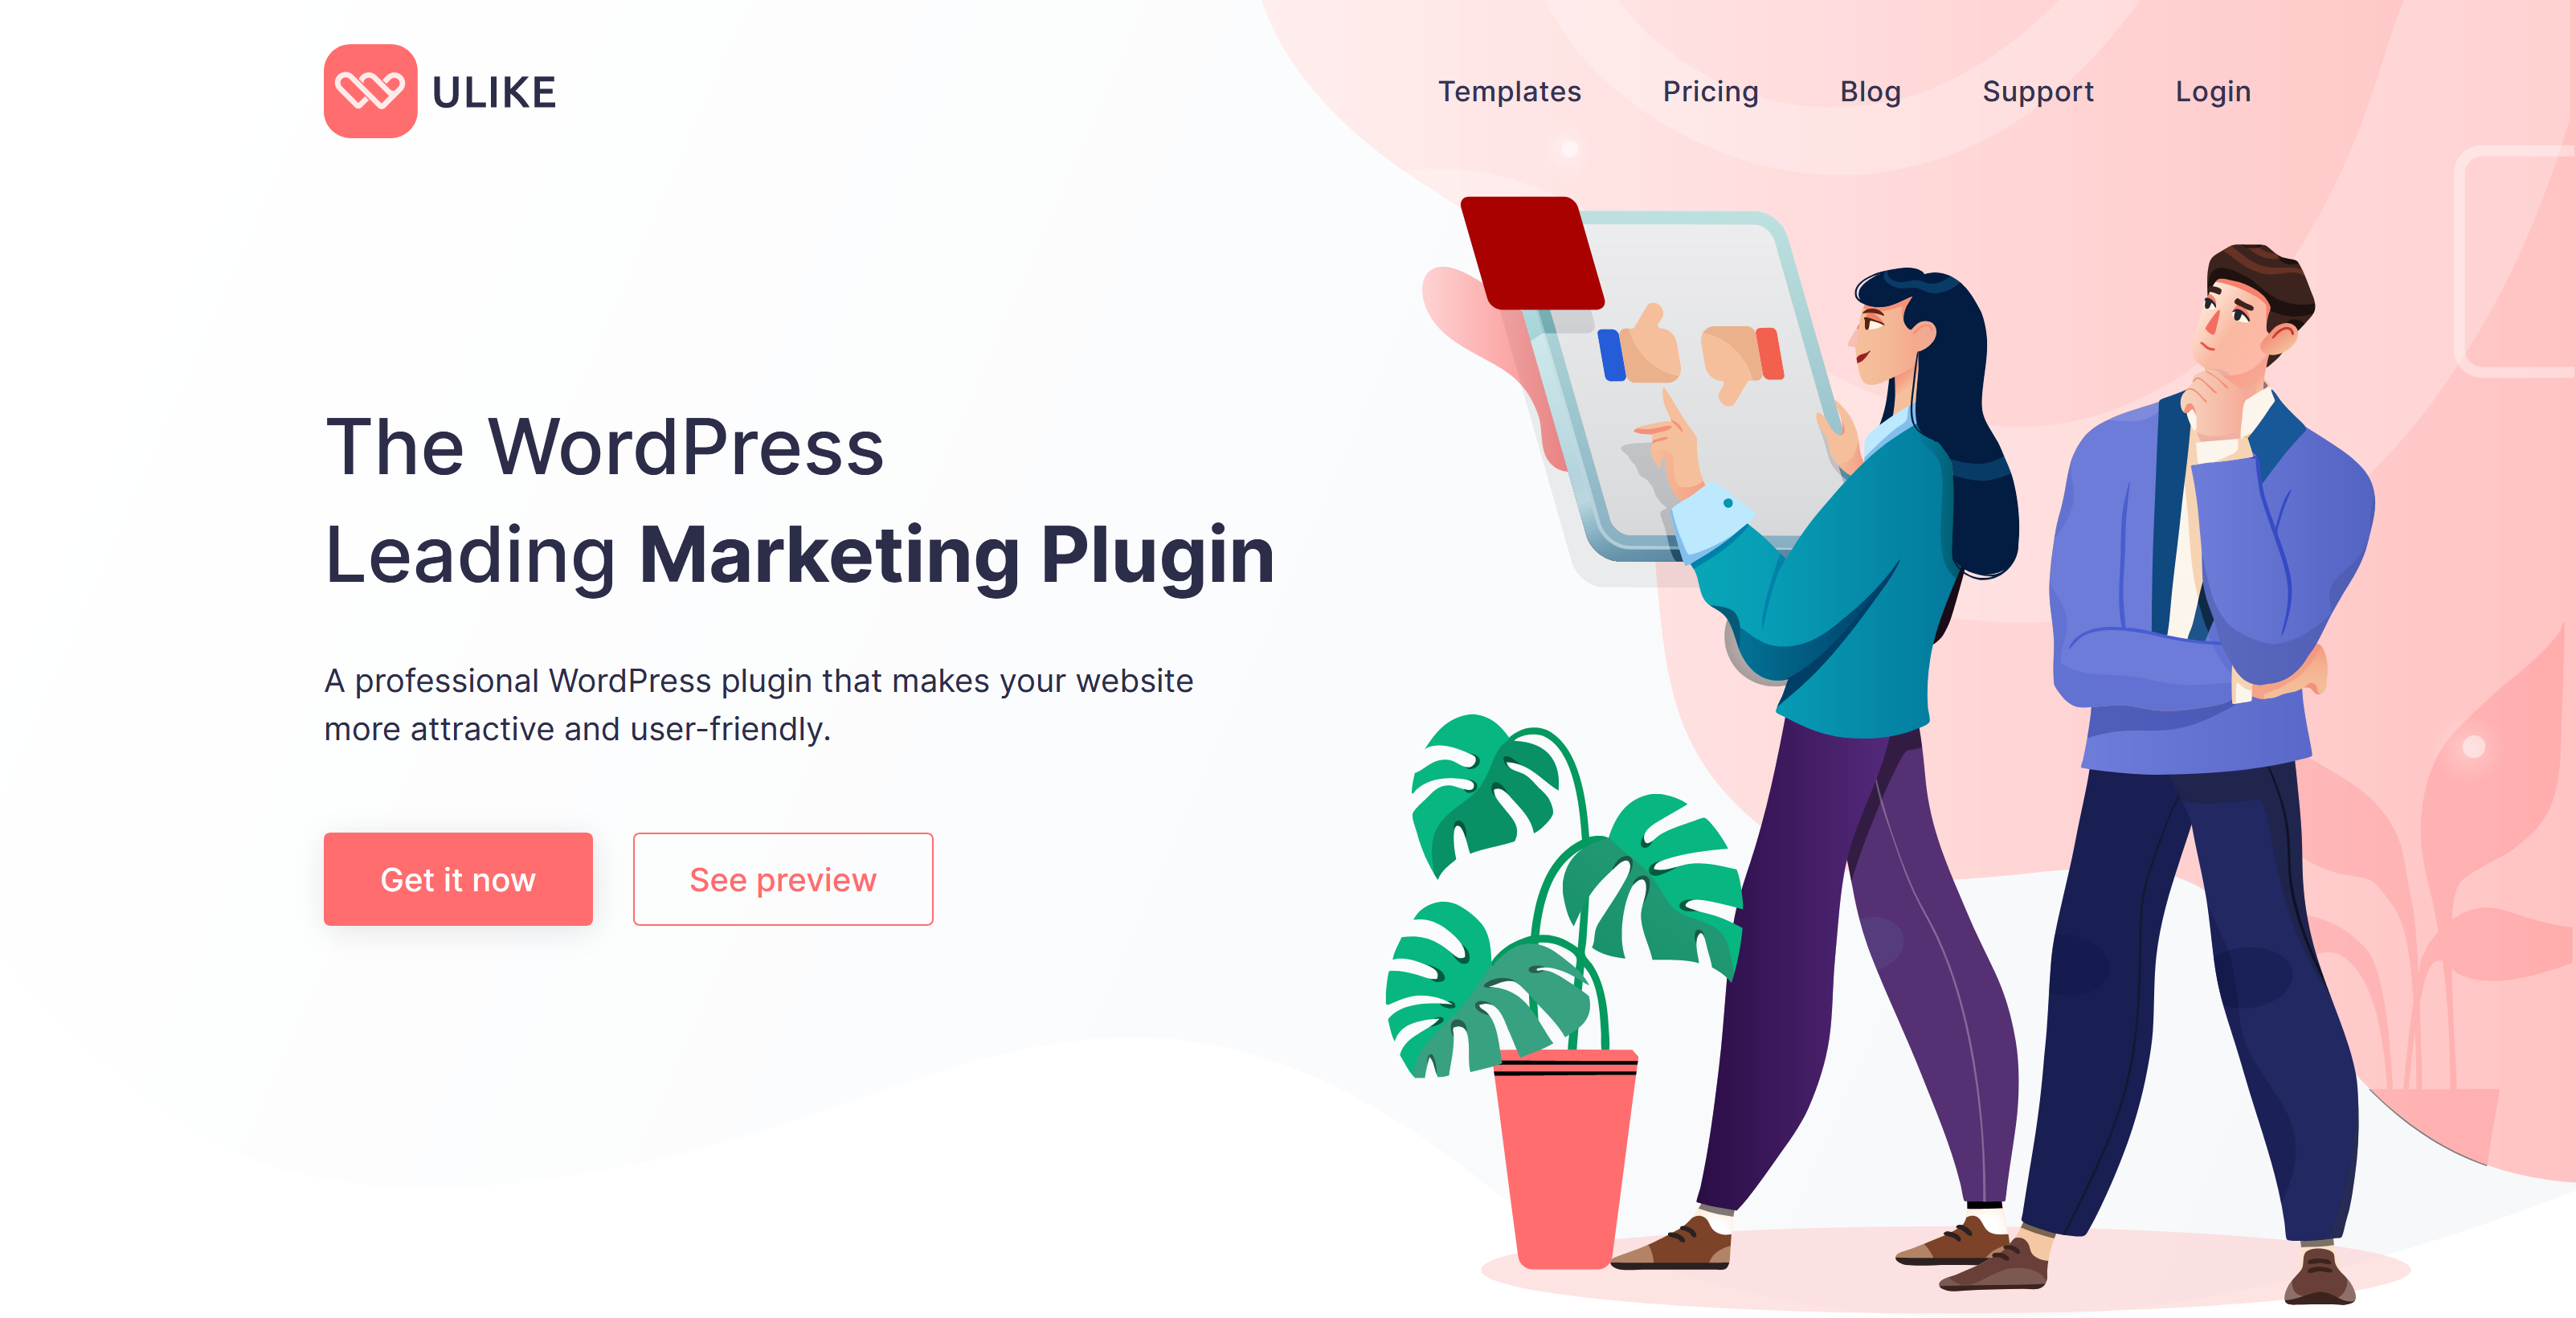 WP ULike Pro 1.6.0 – Most Advanced WordPress Marketing Toolkit